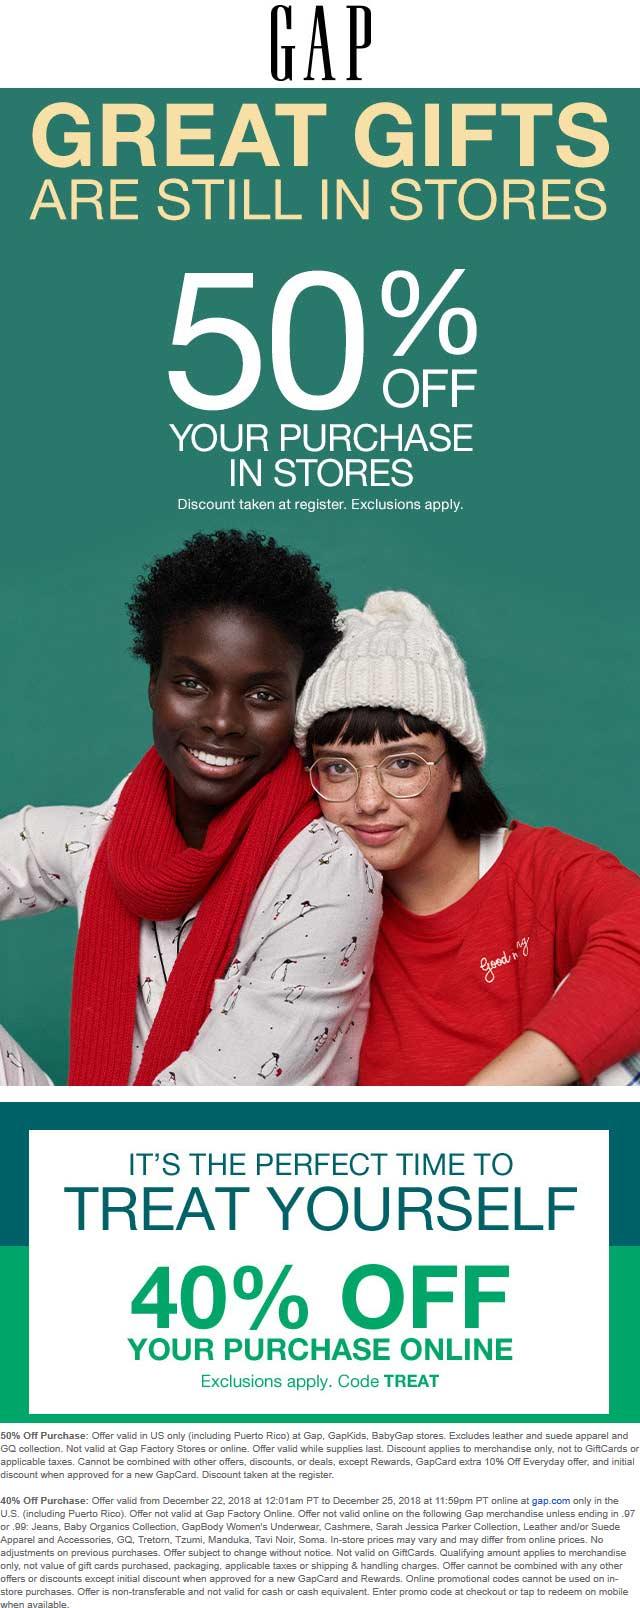 Gap Coupon January 2020 50% off at Gap, or 40% online via promo code TREAT